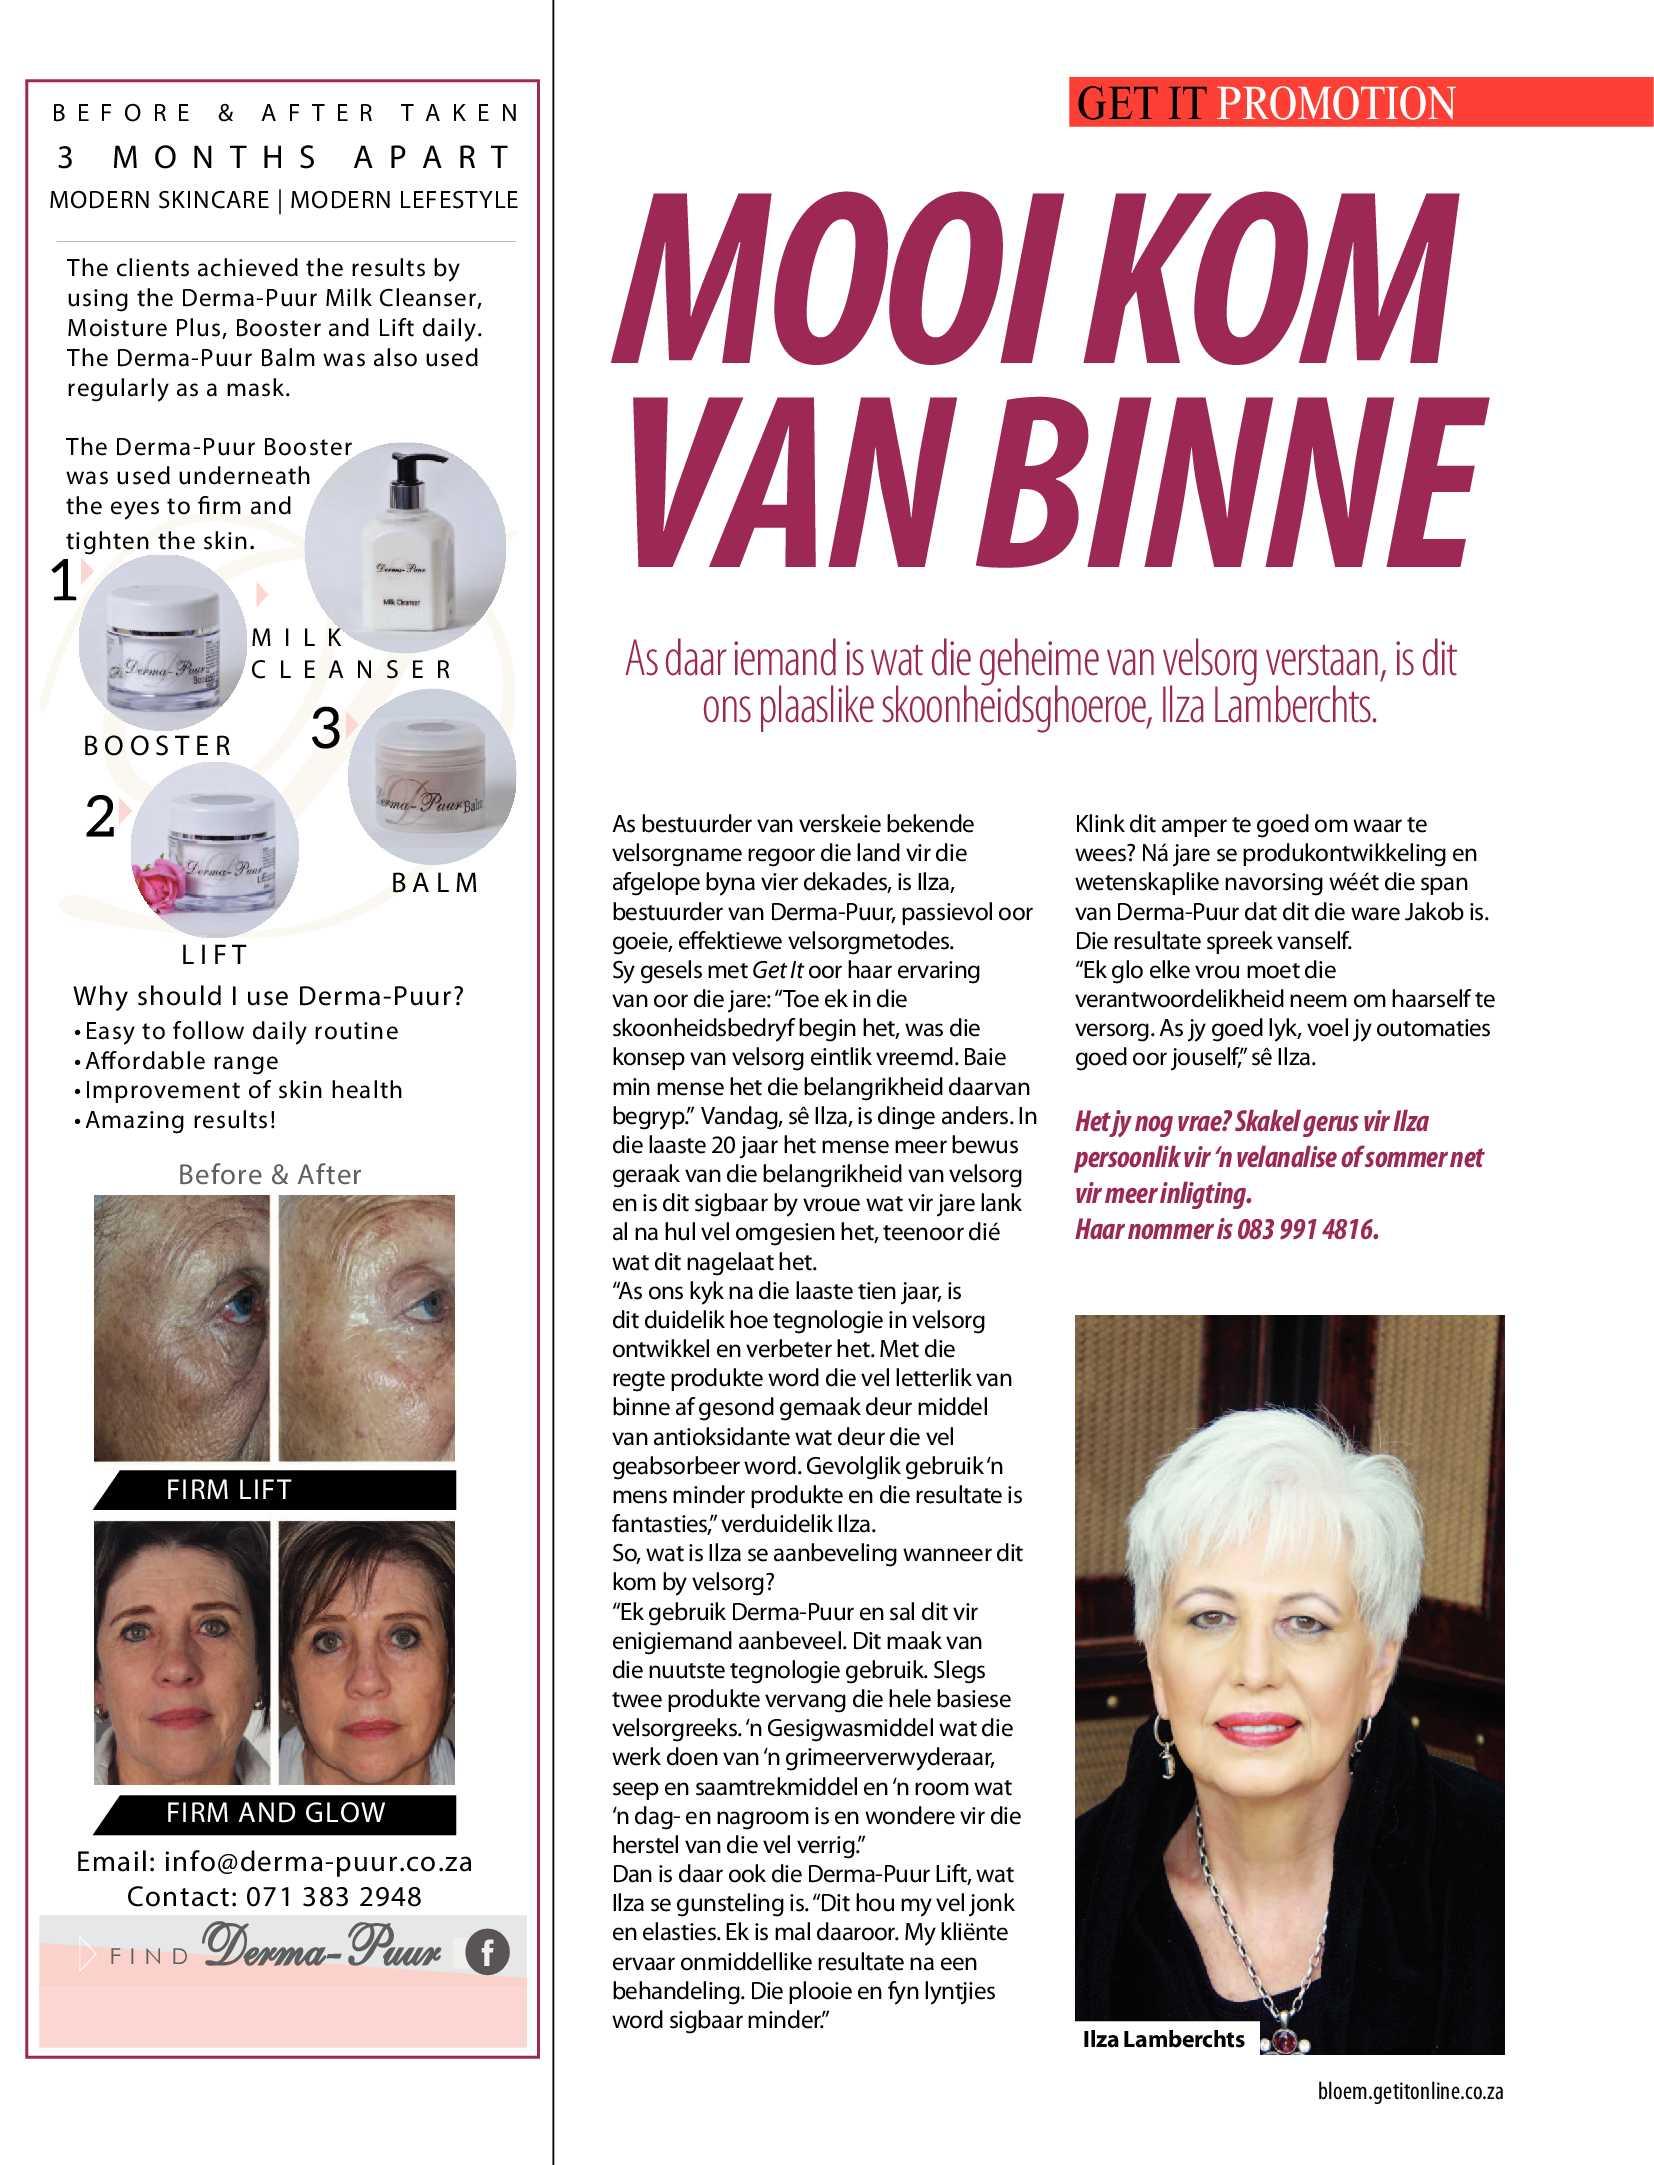 get-bloemfontein-june-2017-epapers-page-32